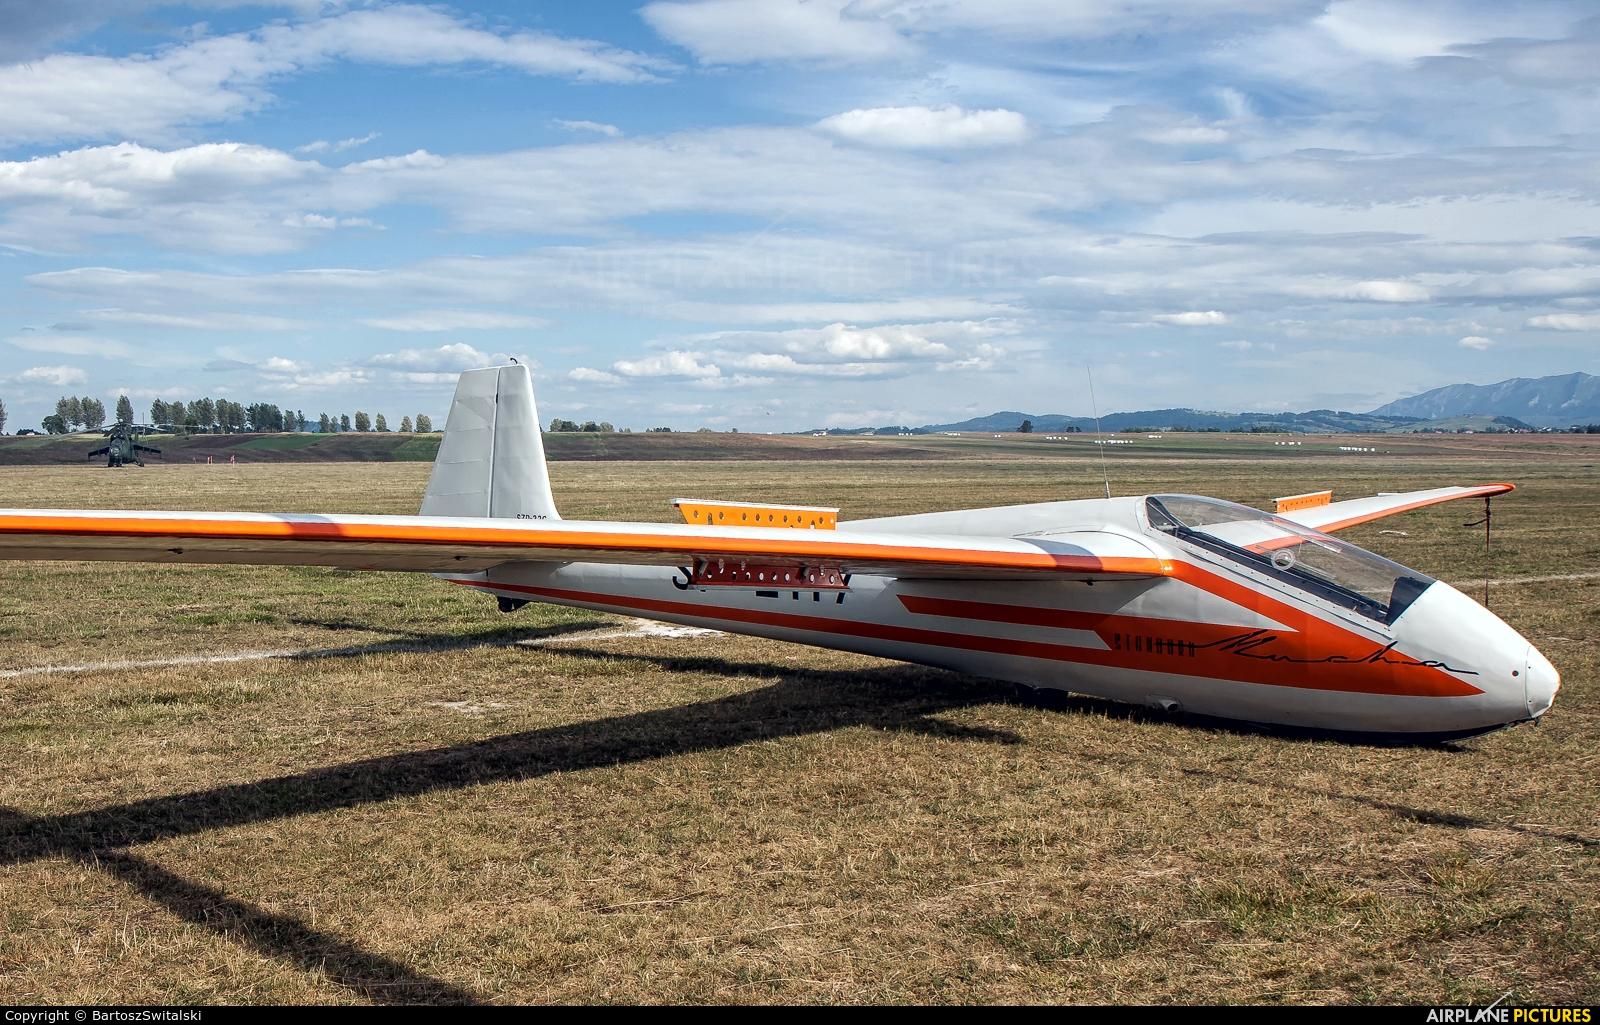 Aeroklub Nowy Targ SP-2117 aircraft at Nowy Targ